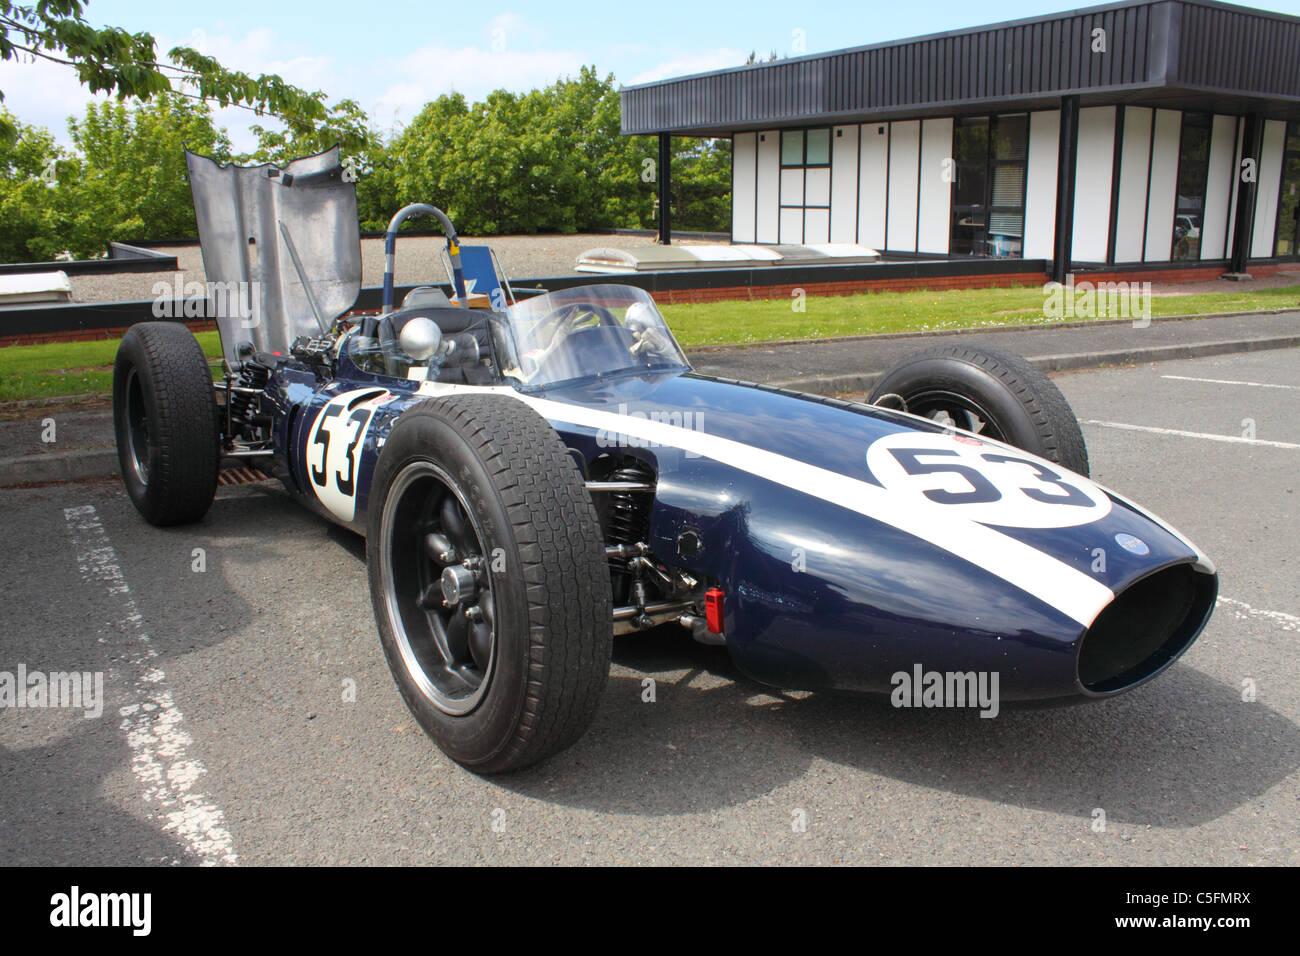 1961 Cooper T53 'lowline' Formula 1 race-car at the Cultra Hillclimb, Northern Ireland - Stock Image